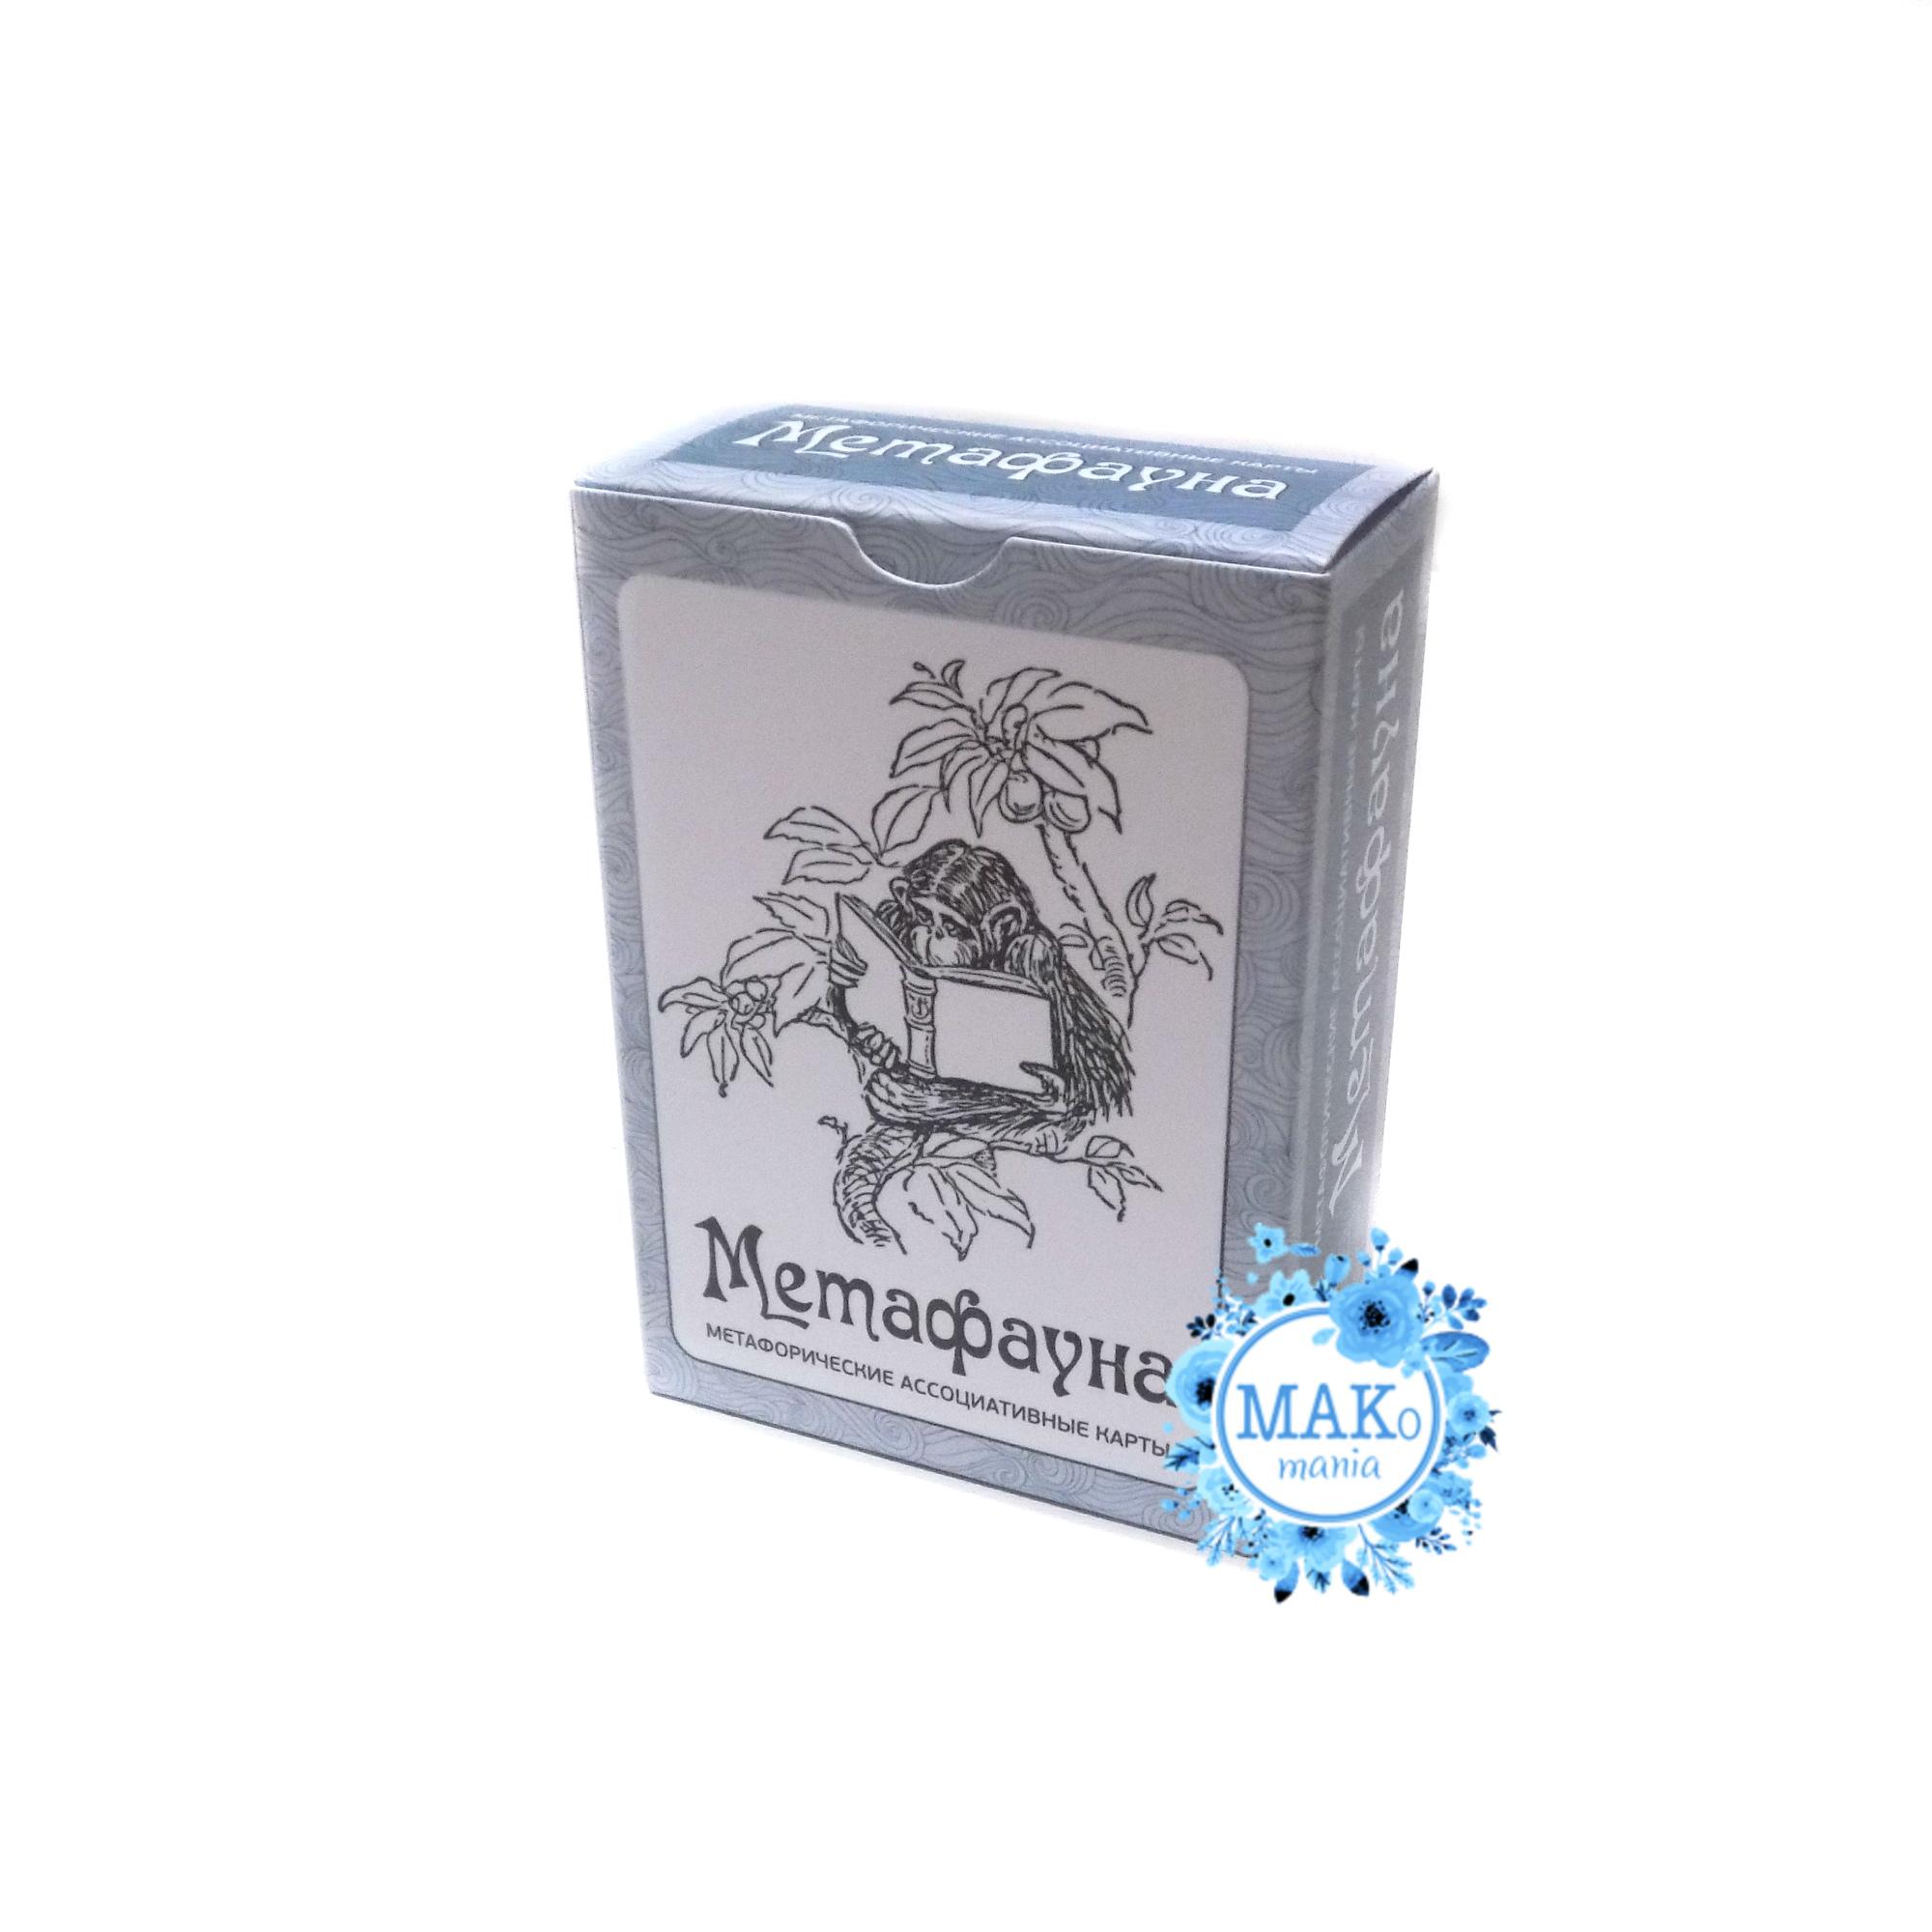 Макомания Метафауна, метафорические карты, интернет-магазин мак, МАК,купить МАК